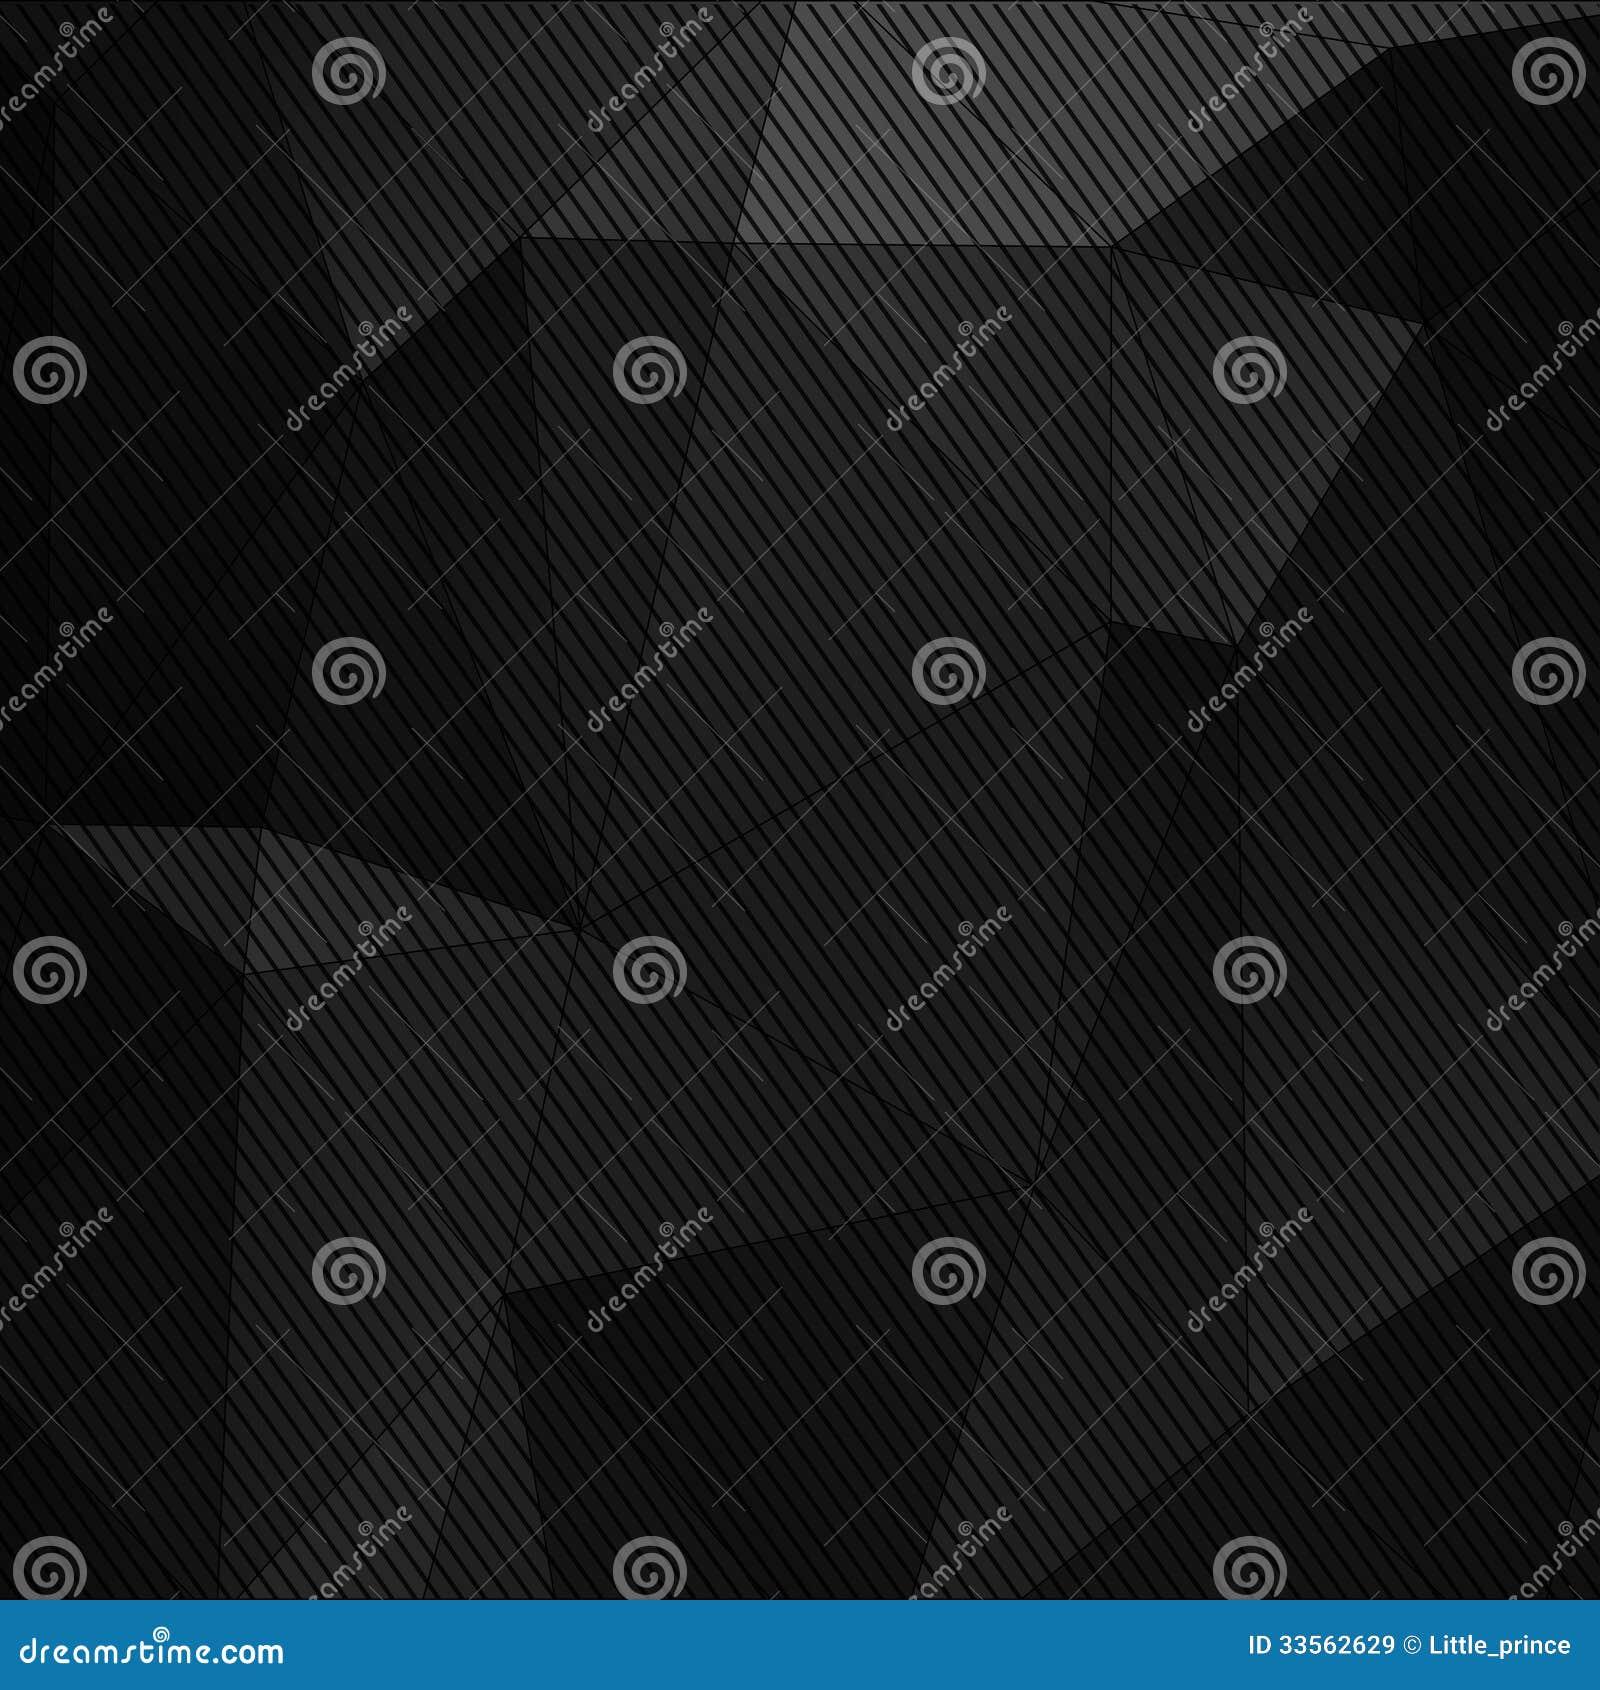 technology background black - photo #20